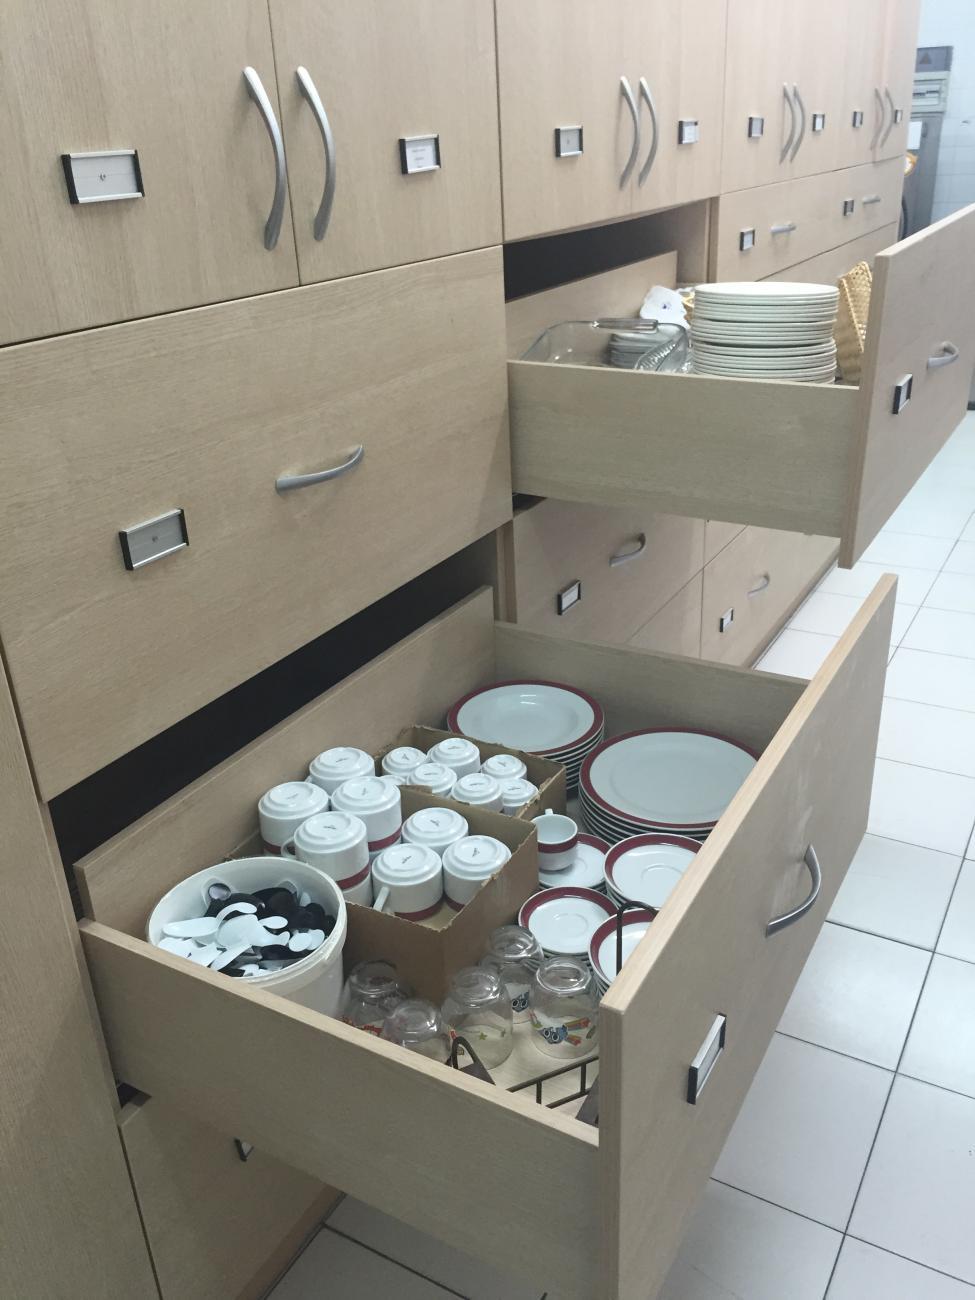 Detalle de cajones de mueble